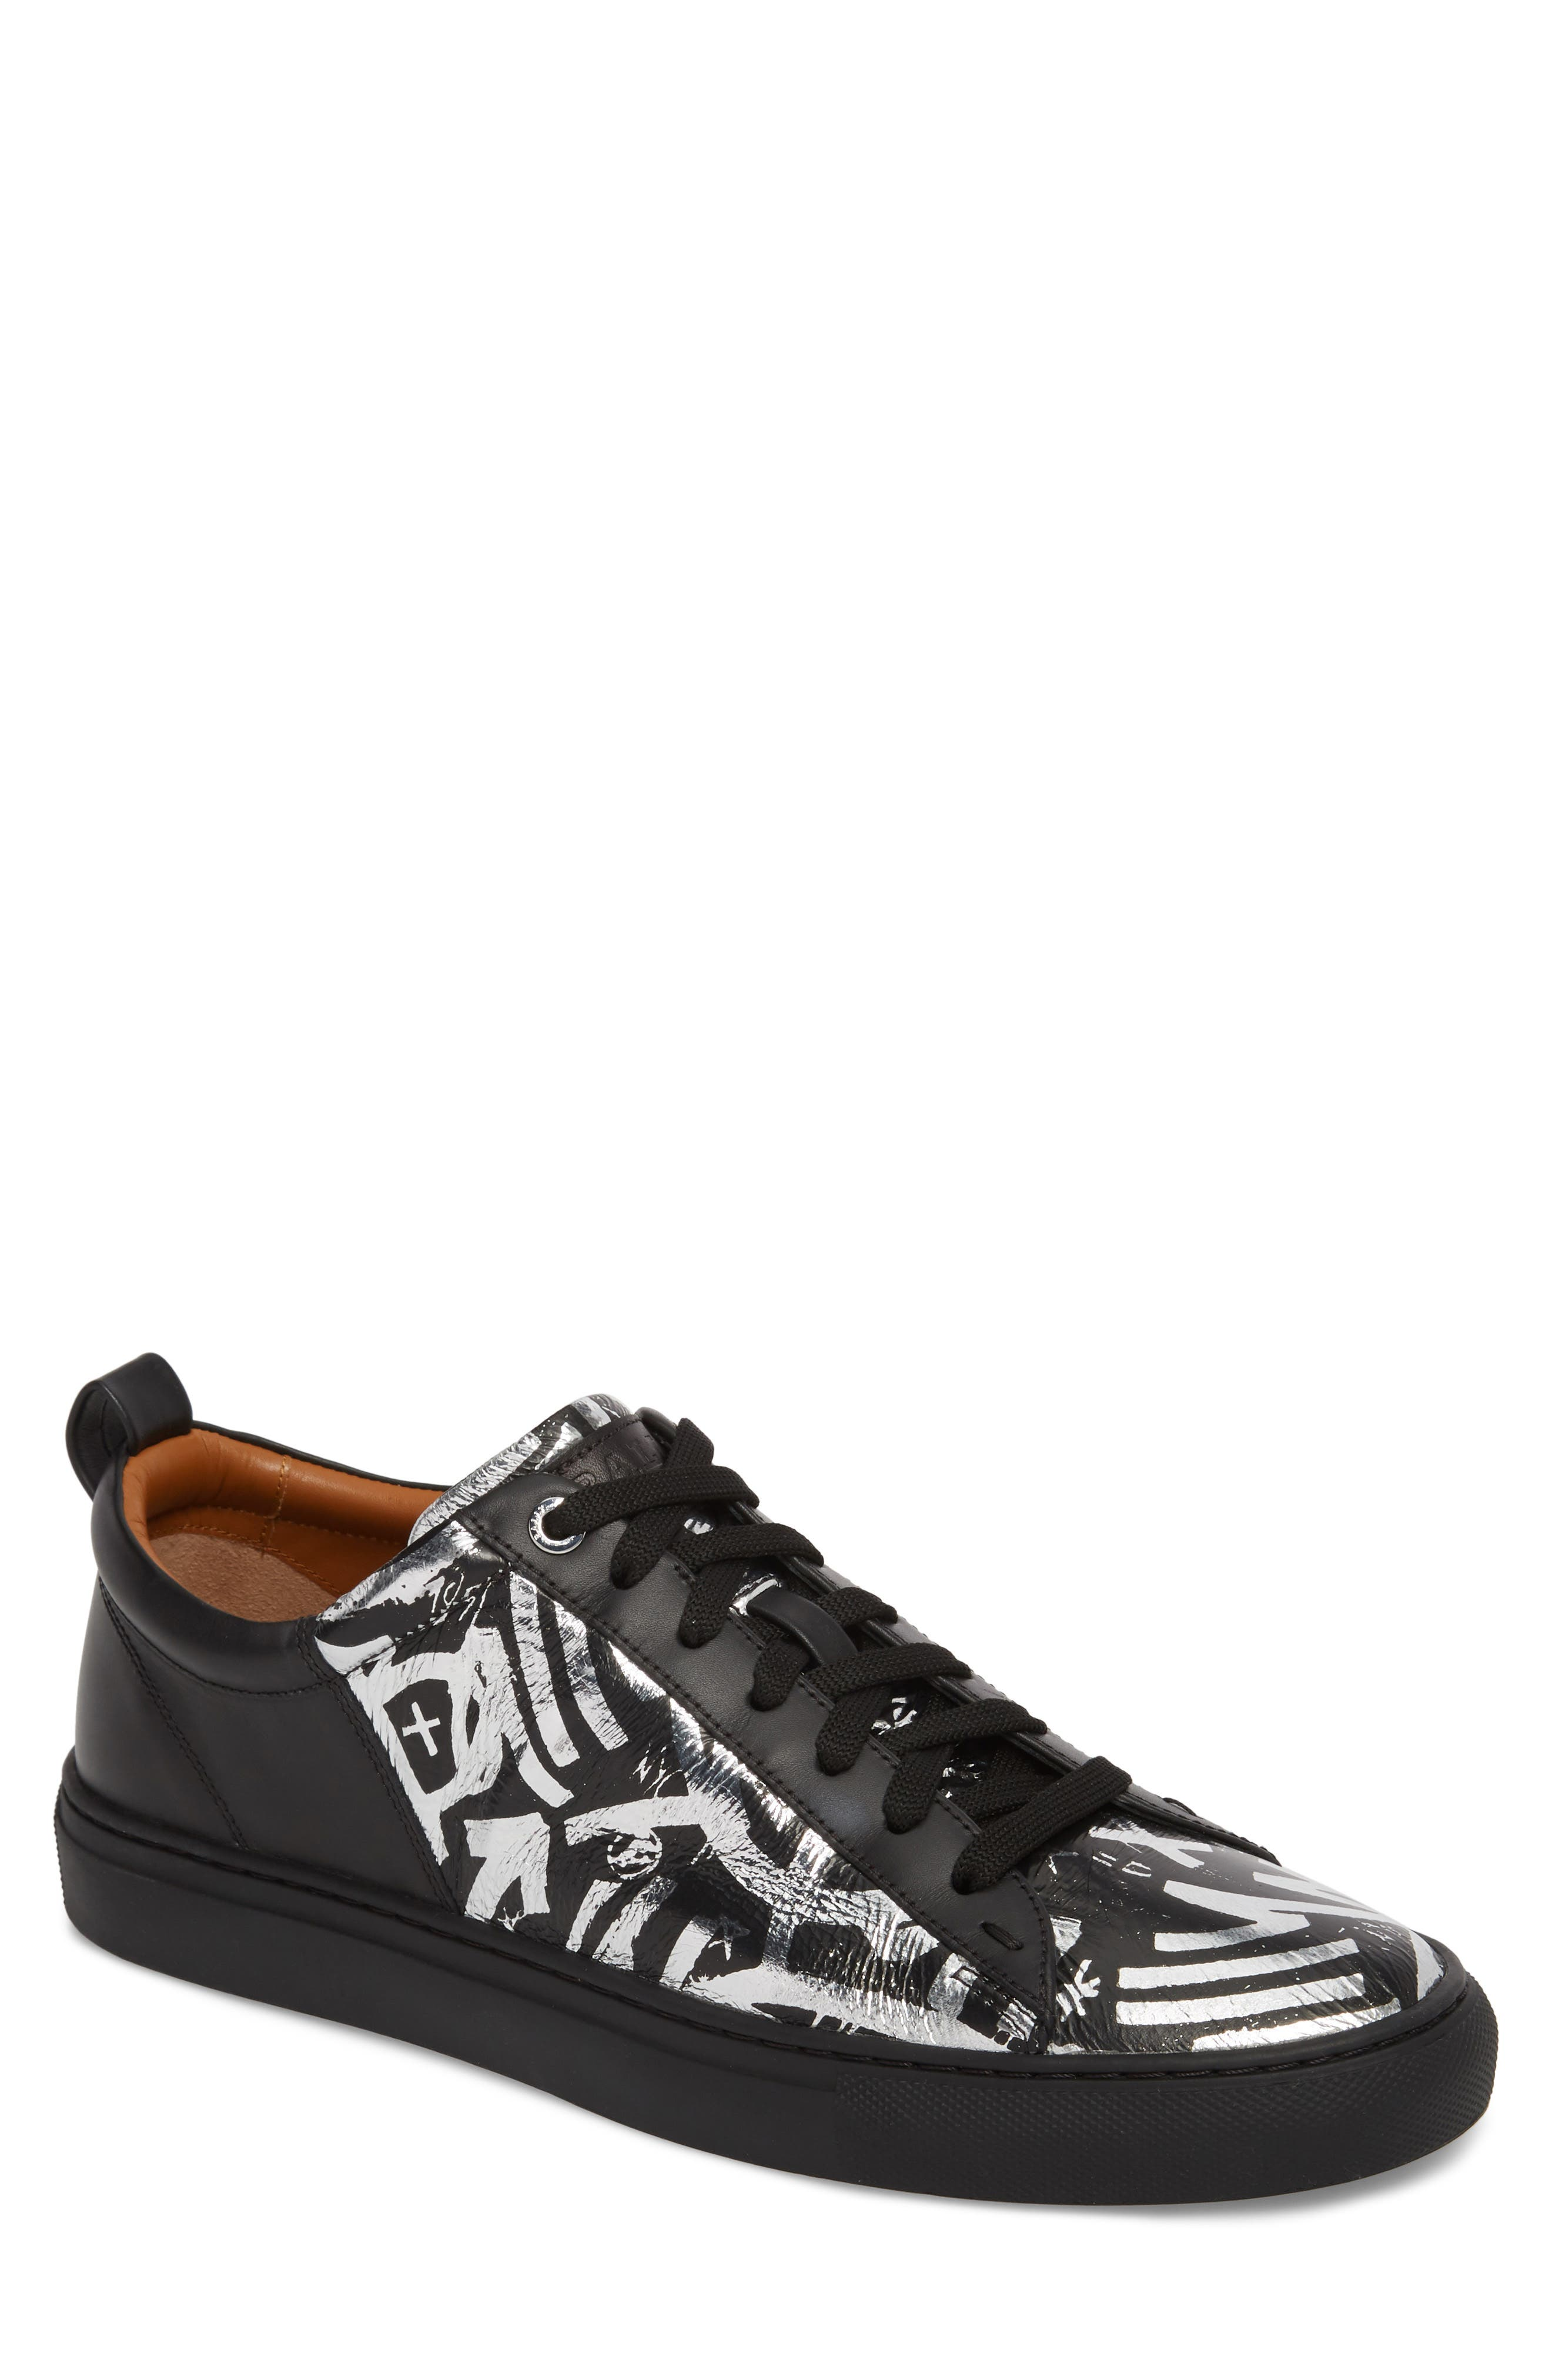 Bally Herbi Low Top Sneaker (Men)